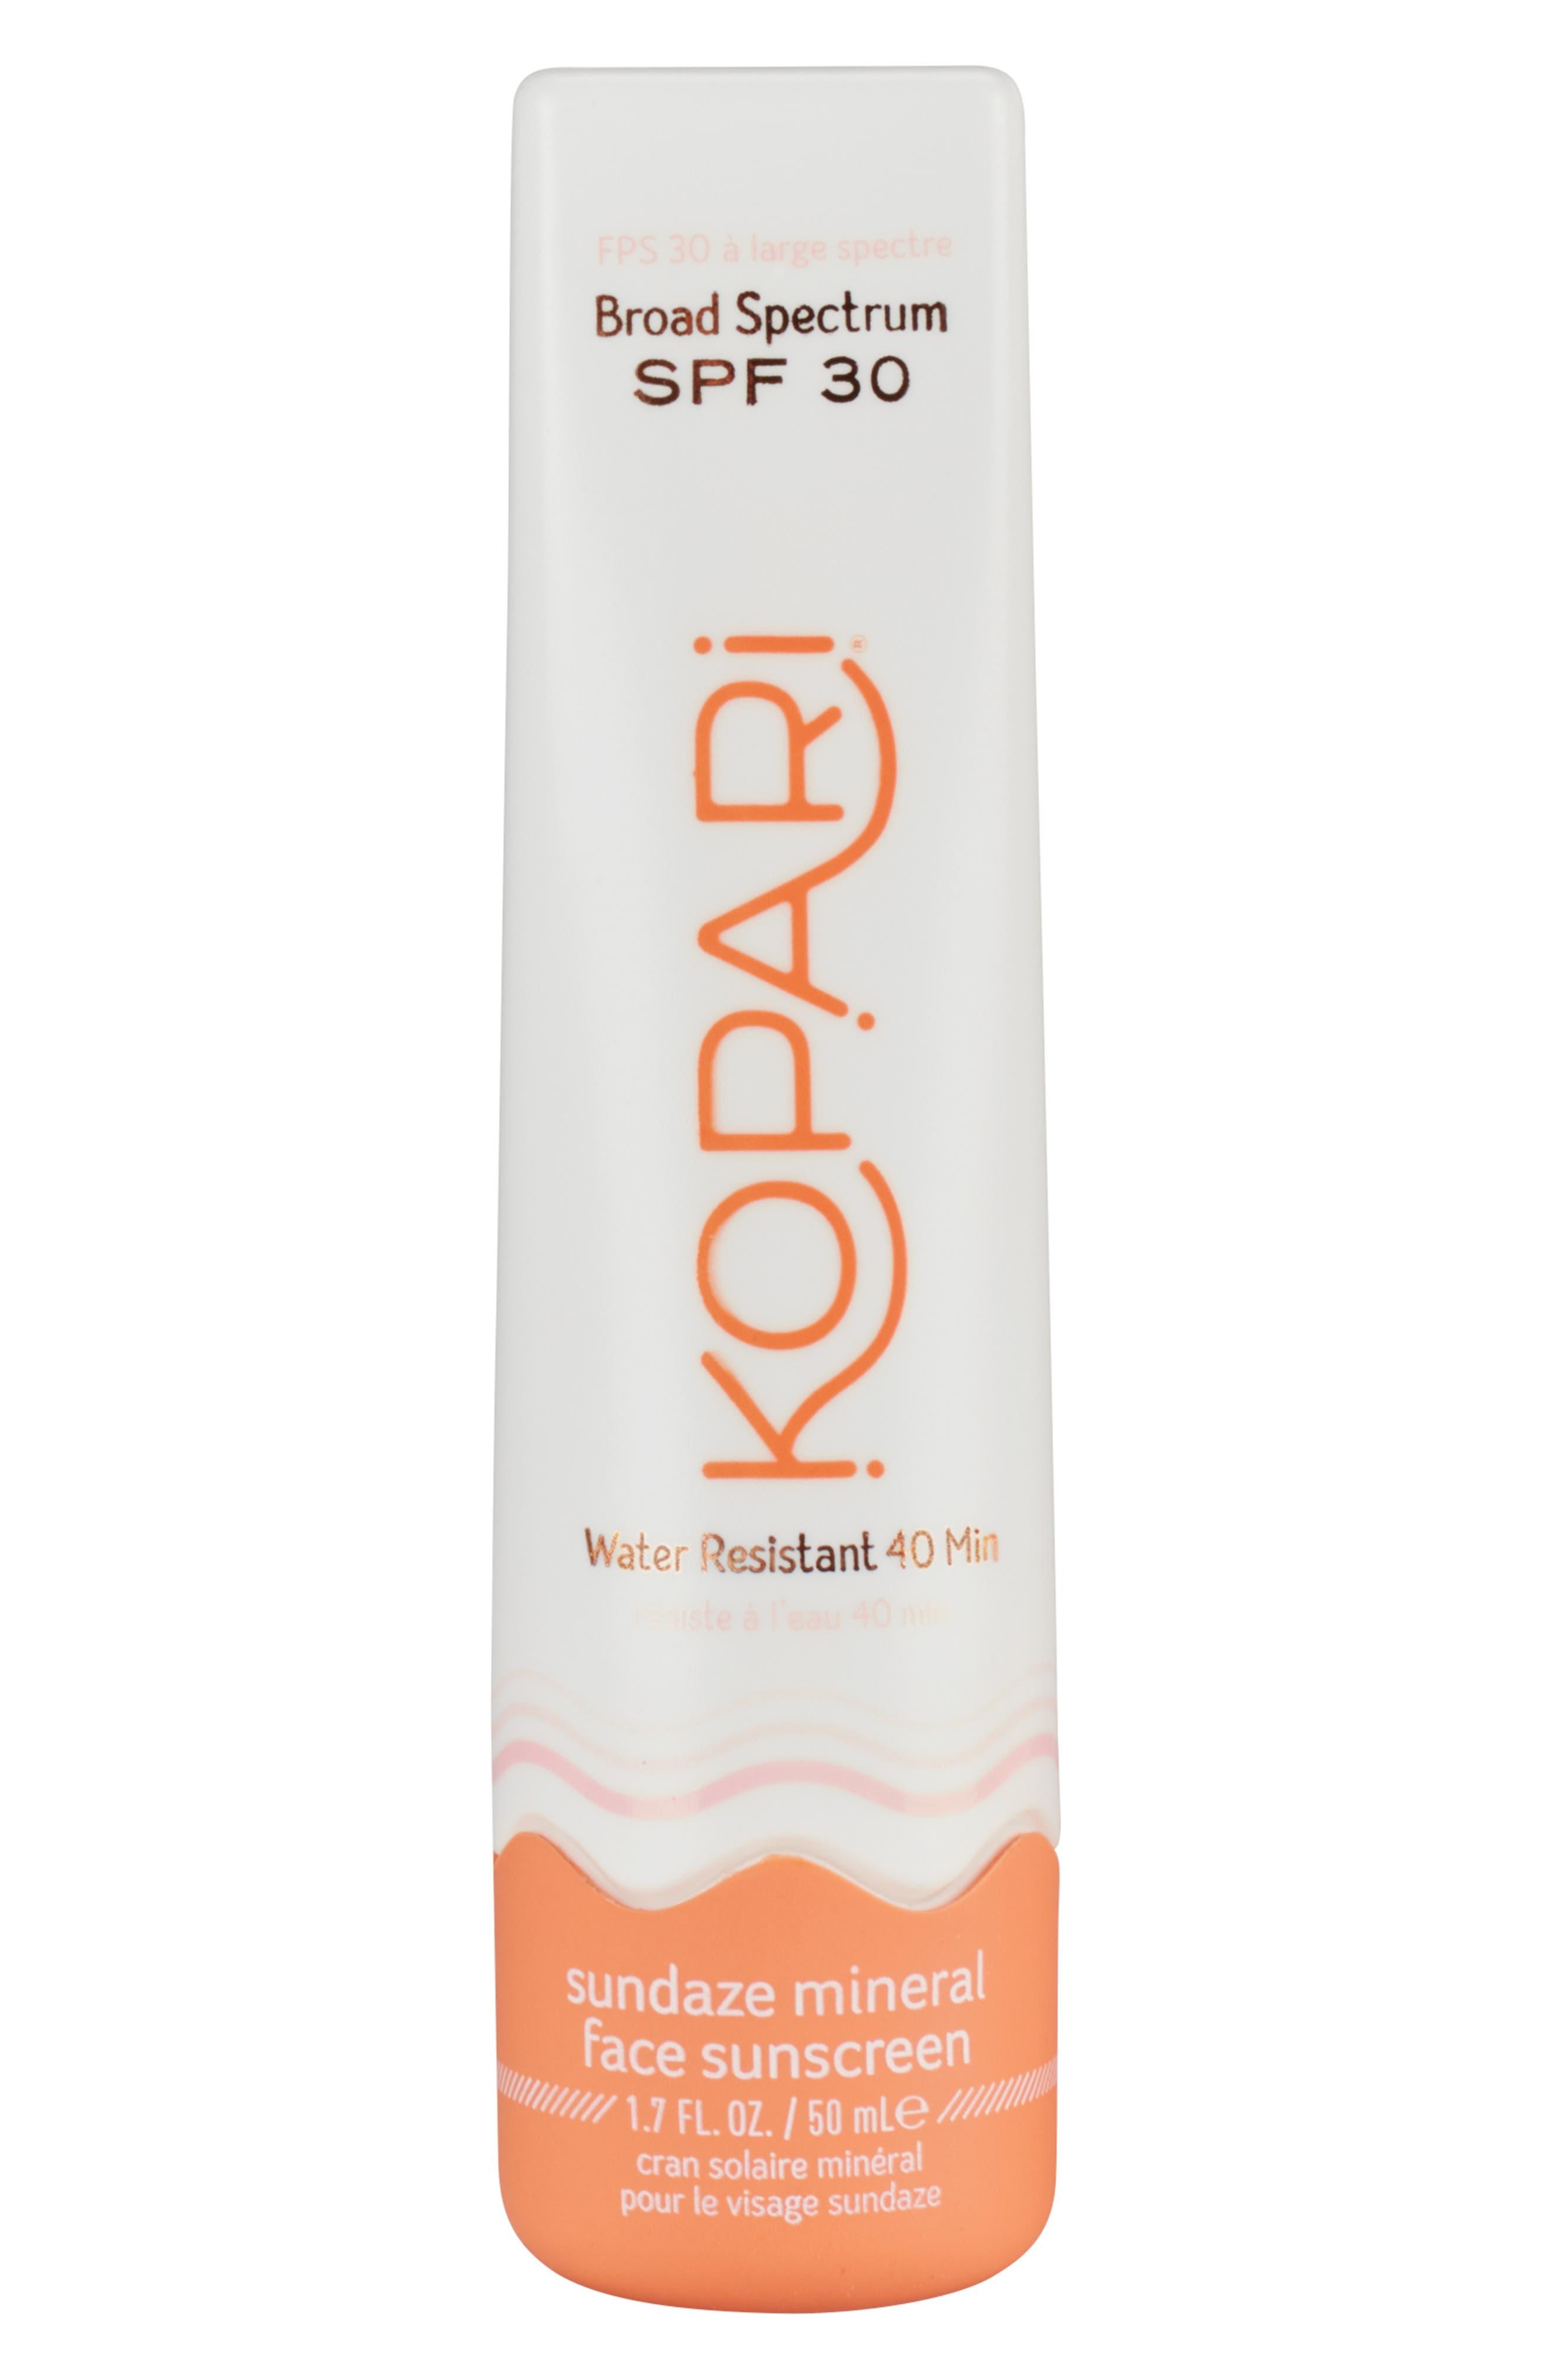 Sundaze Mineral Face Sunscreen SPF 30, Main, color, NO COLOR